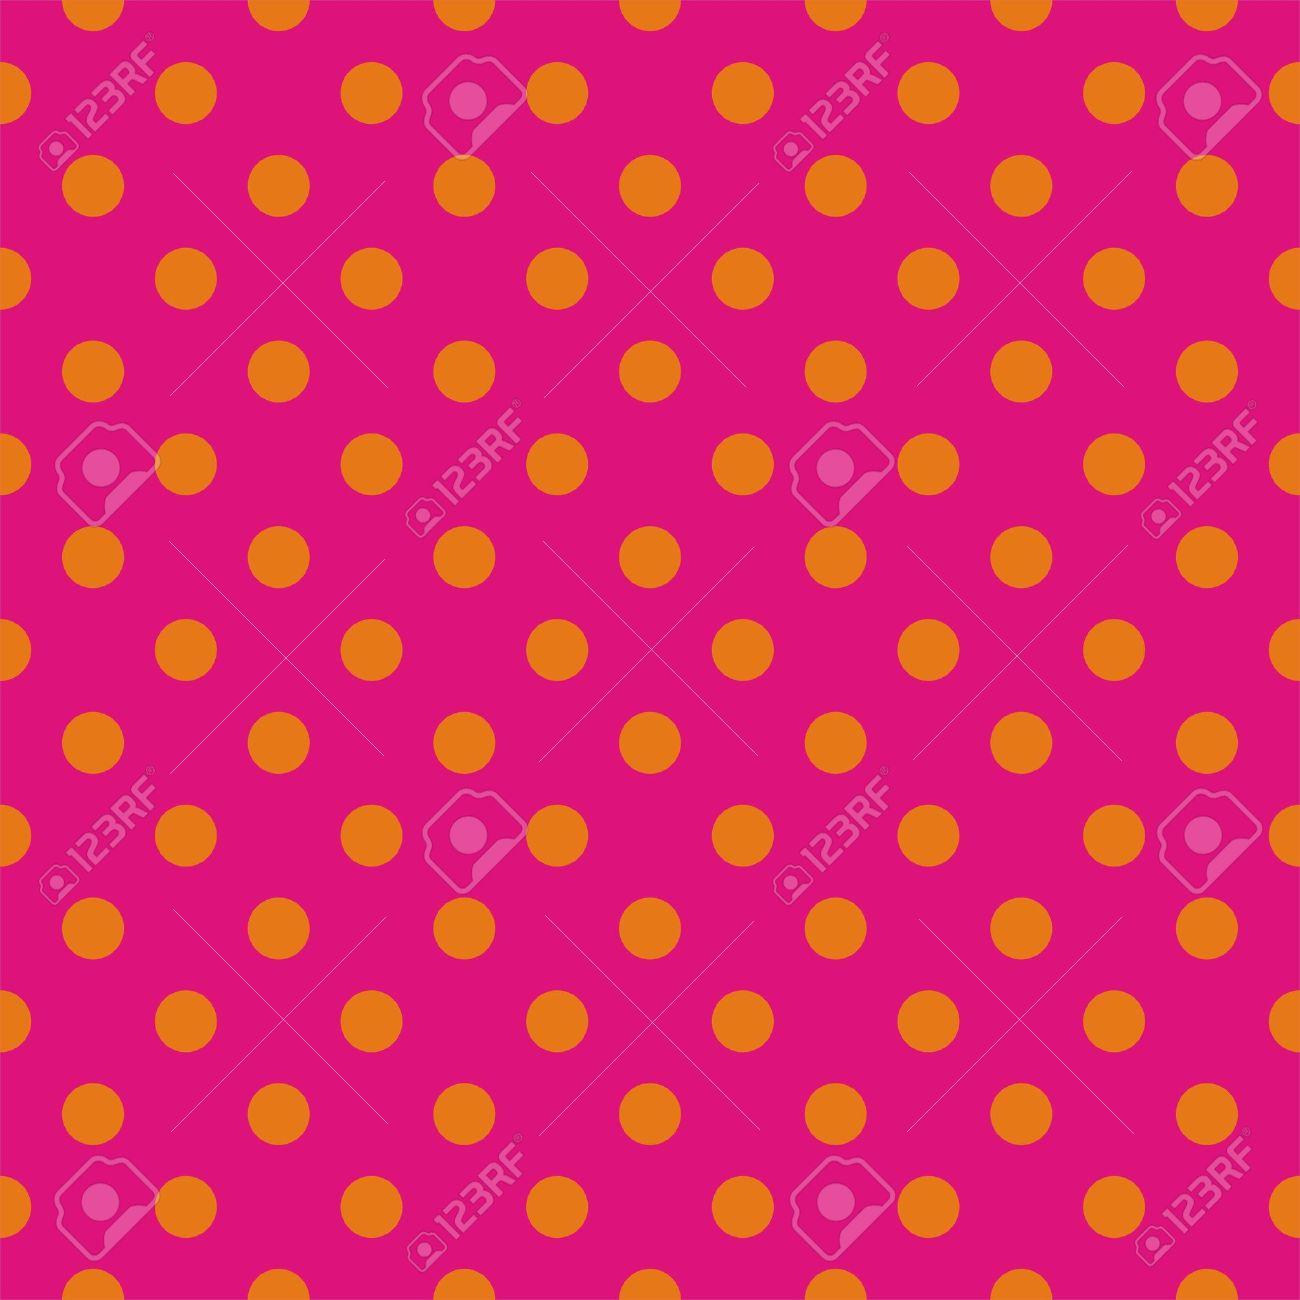 Orange polka dots on neon pink background seamless vector orange polka dots on neon pink background seamless vector pattern for backgrounds blogs voltagebd Images